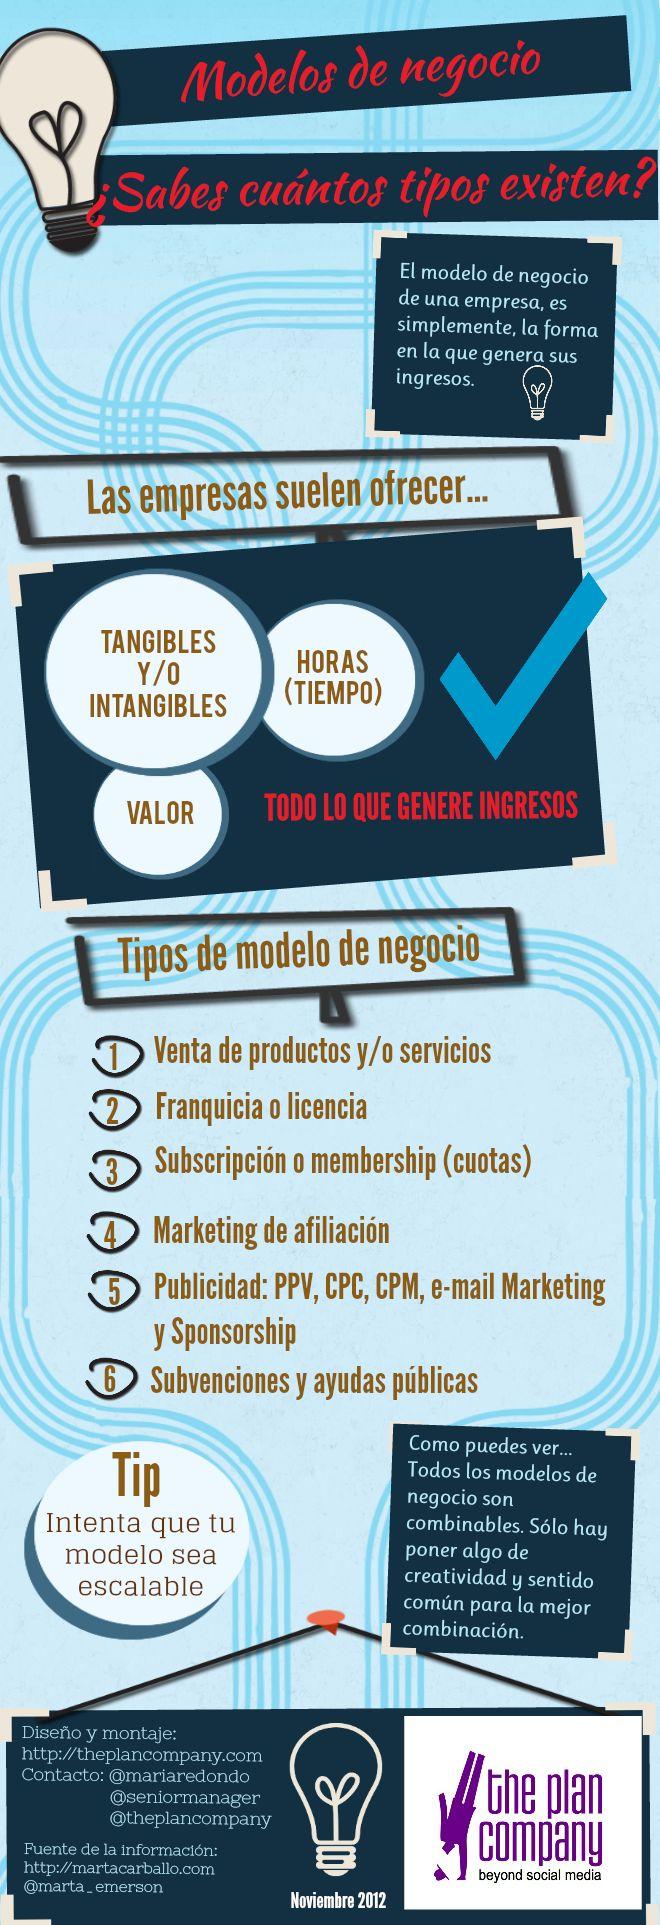 Modelos de negocios. #Infografía en español